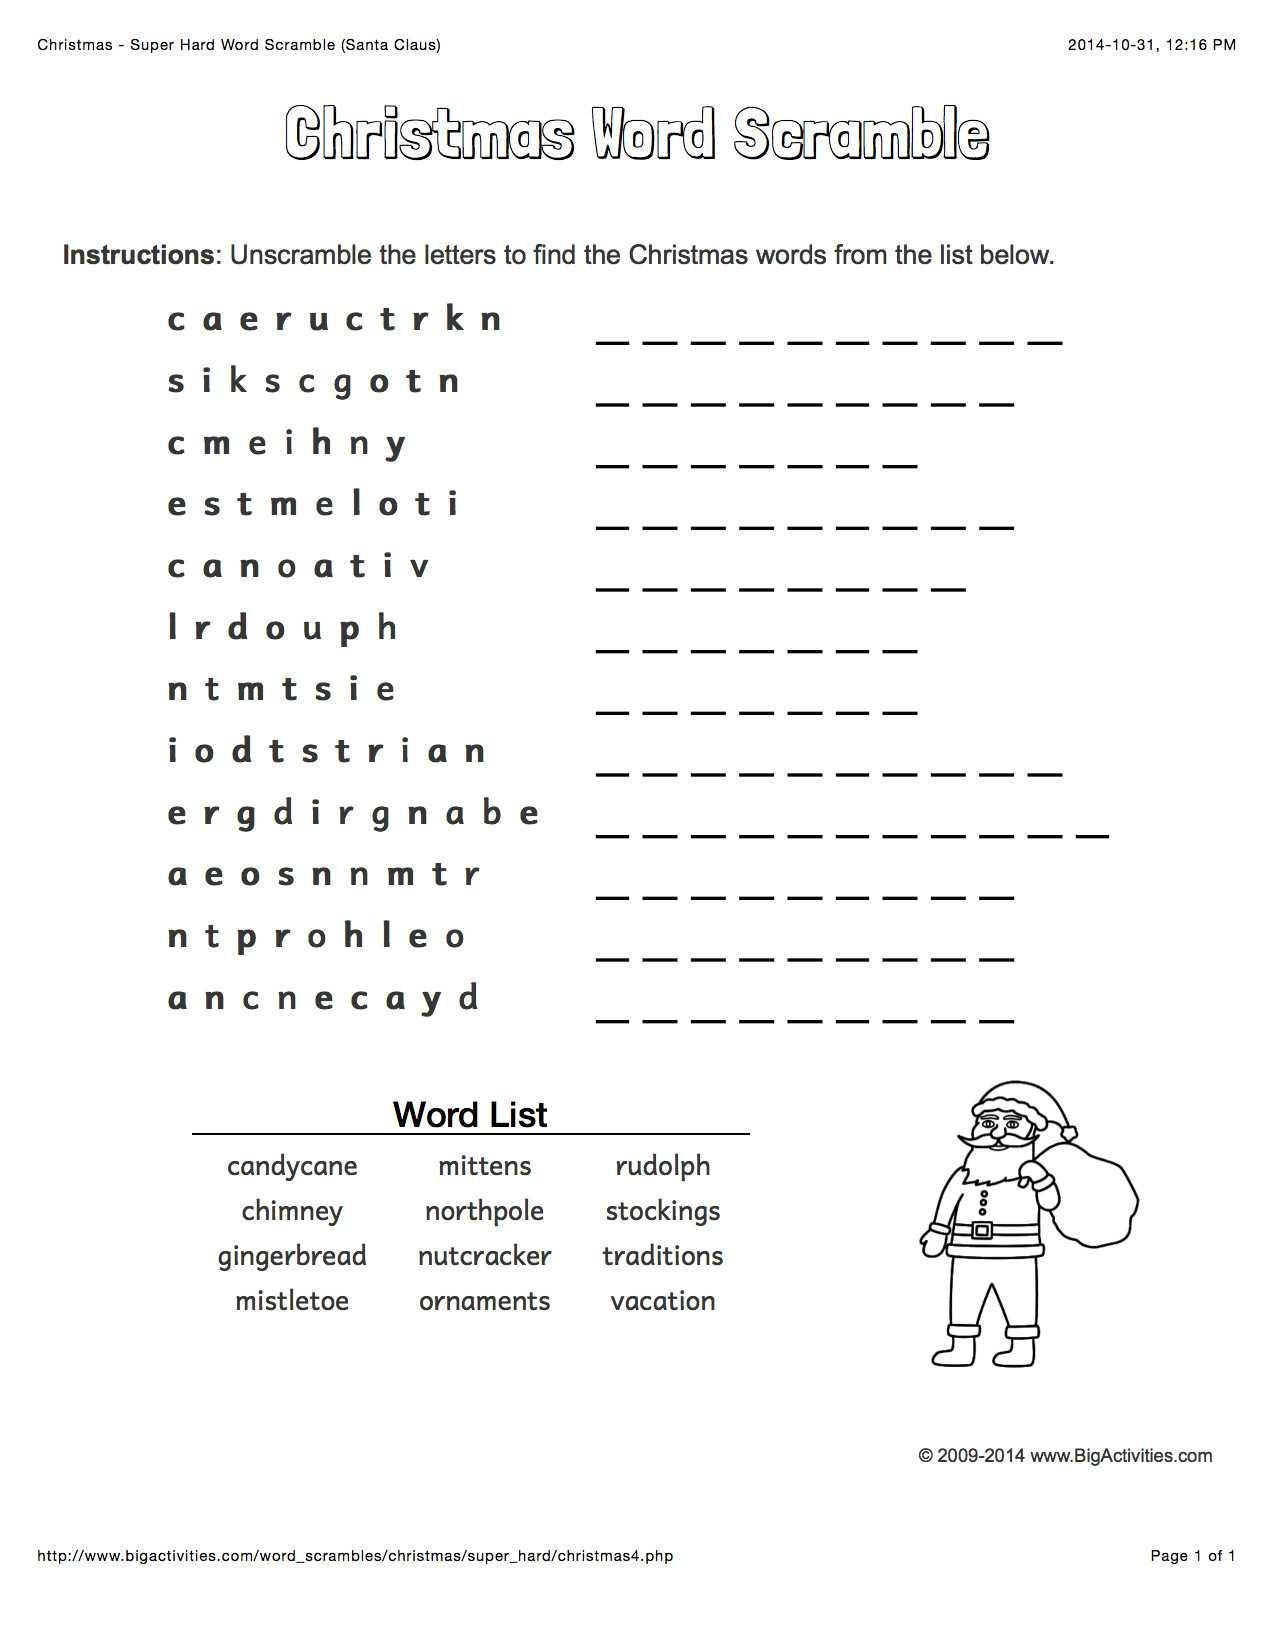 Unscramble Sentences Worksheets 1st Grade Also The